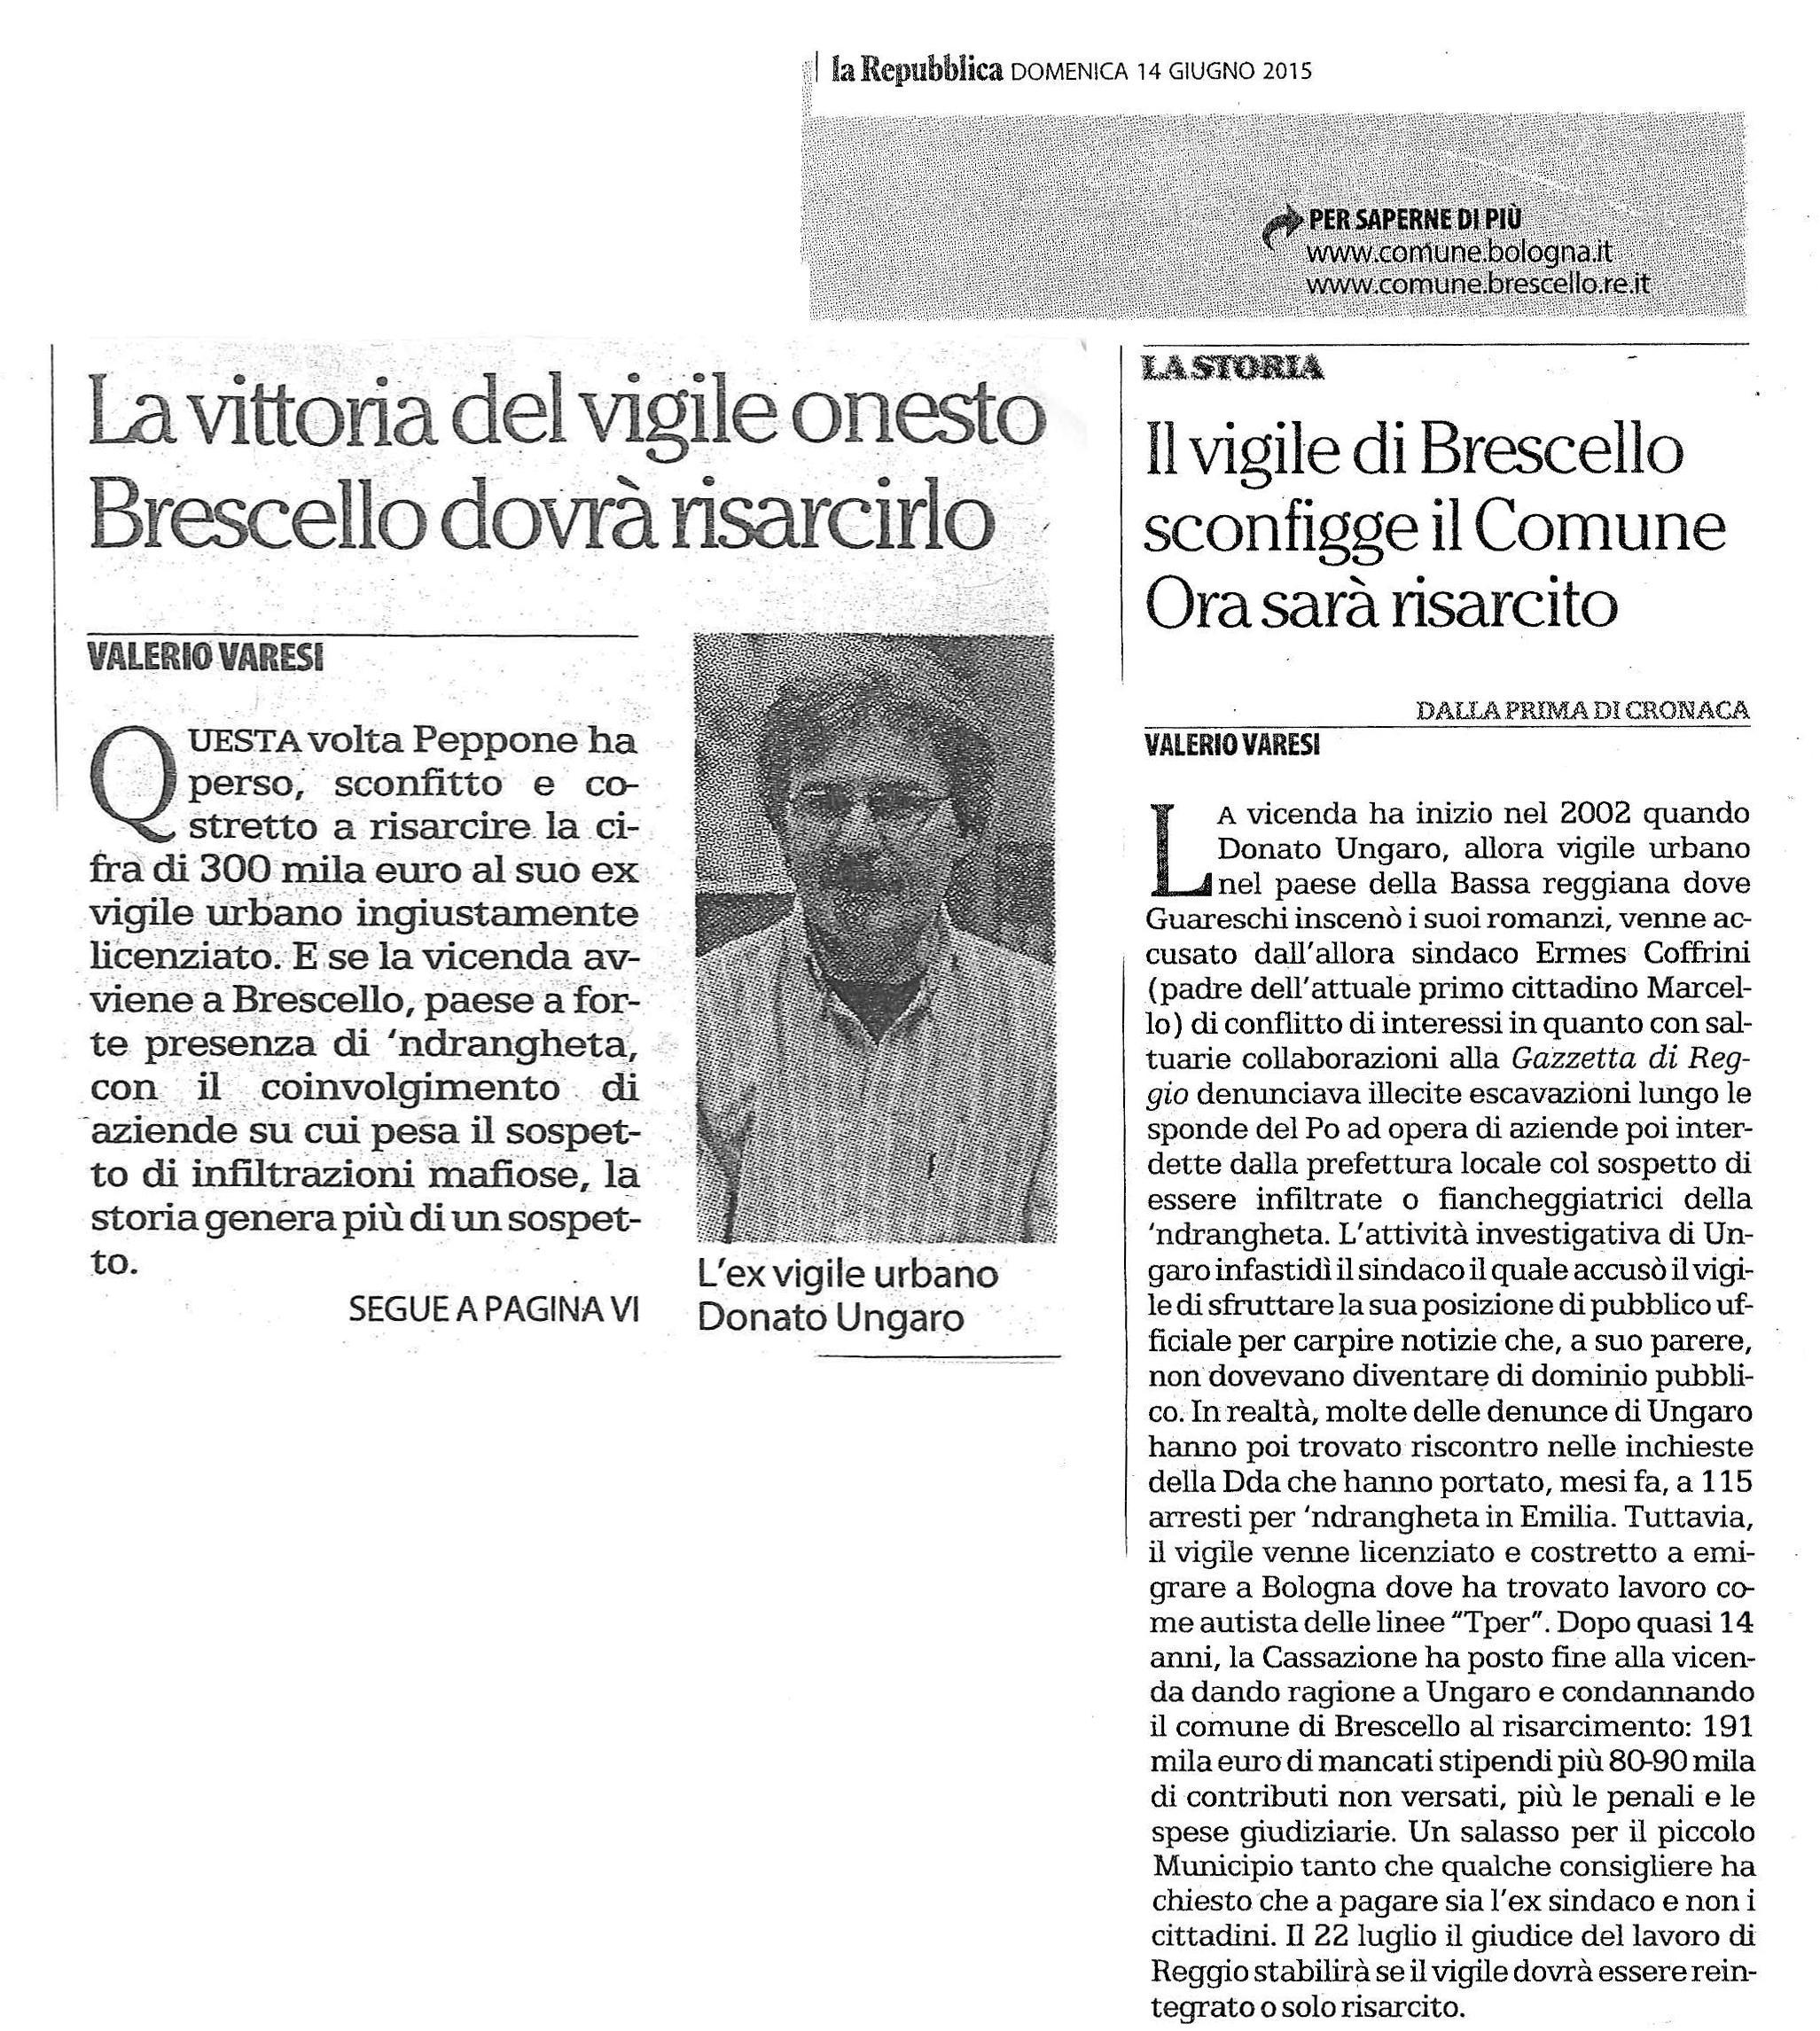 14_6_15_repubblica_vigile